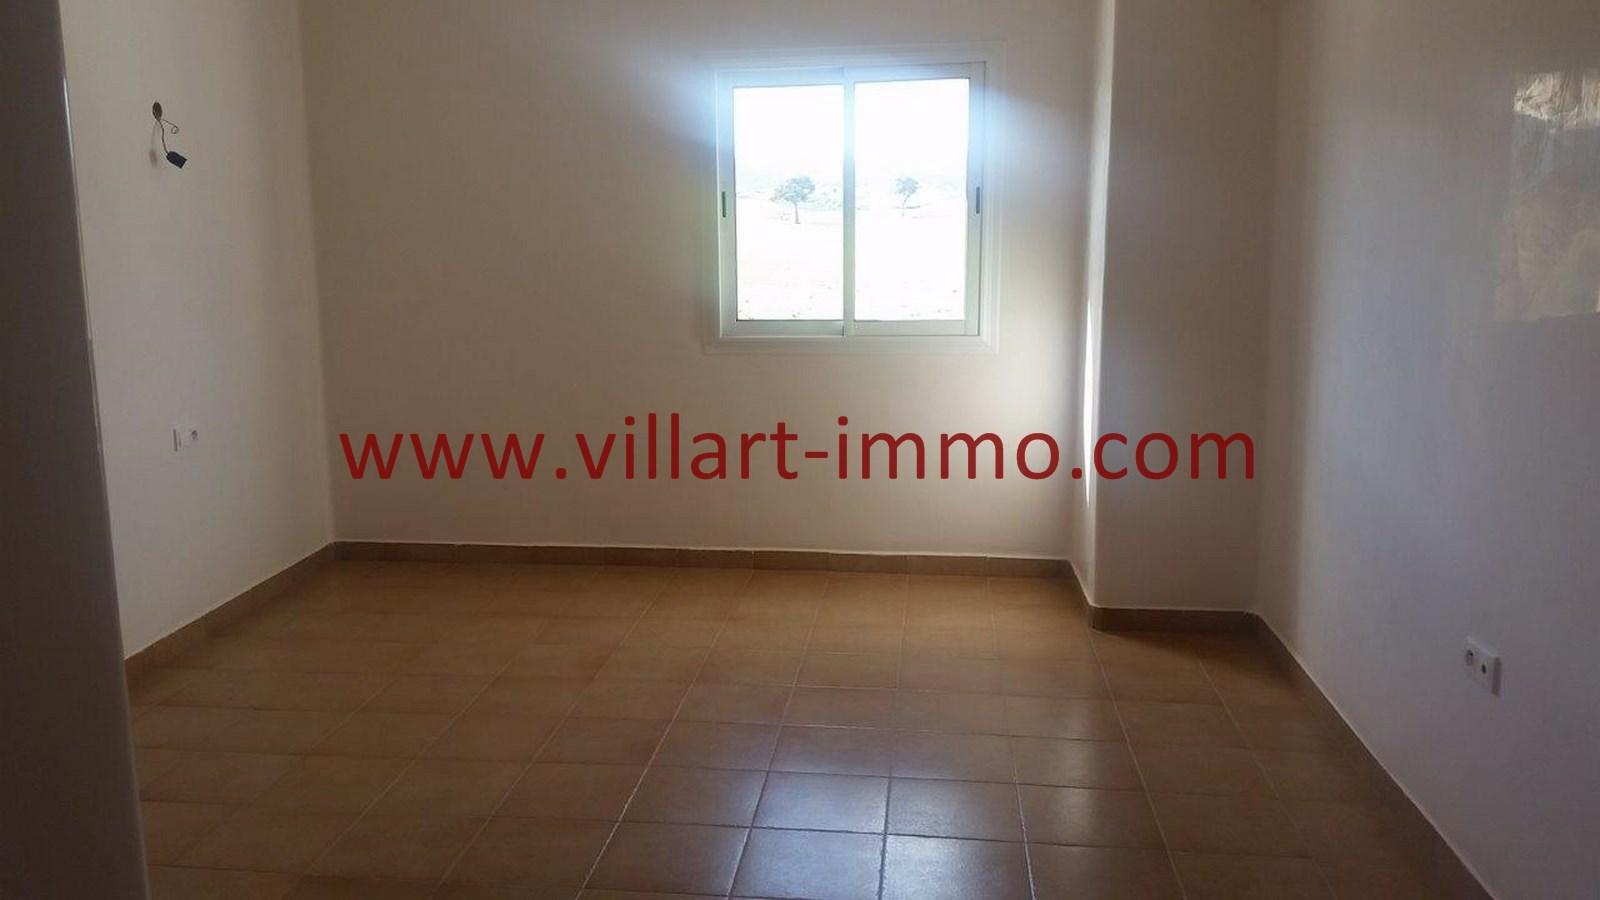 6-vente-appartement-region-tetouan-mdiq-chambre-2-va395-villart-immo